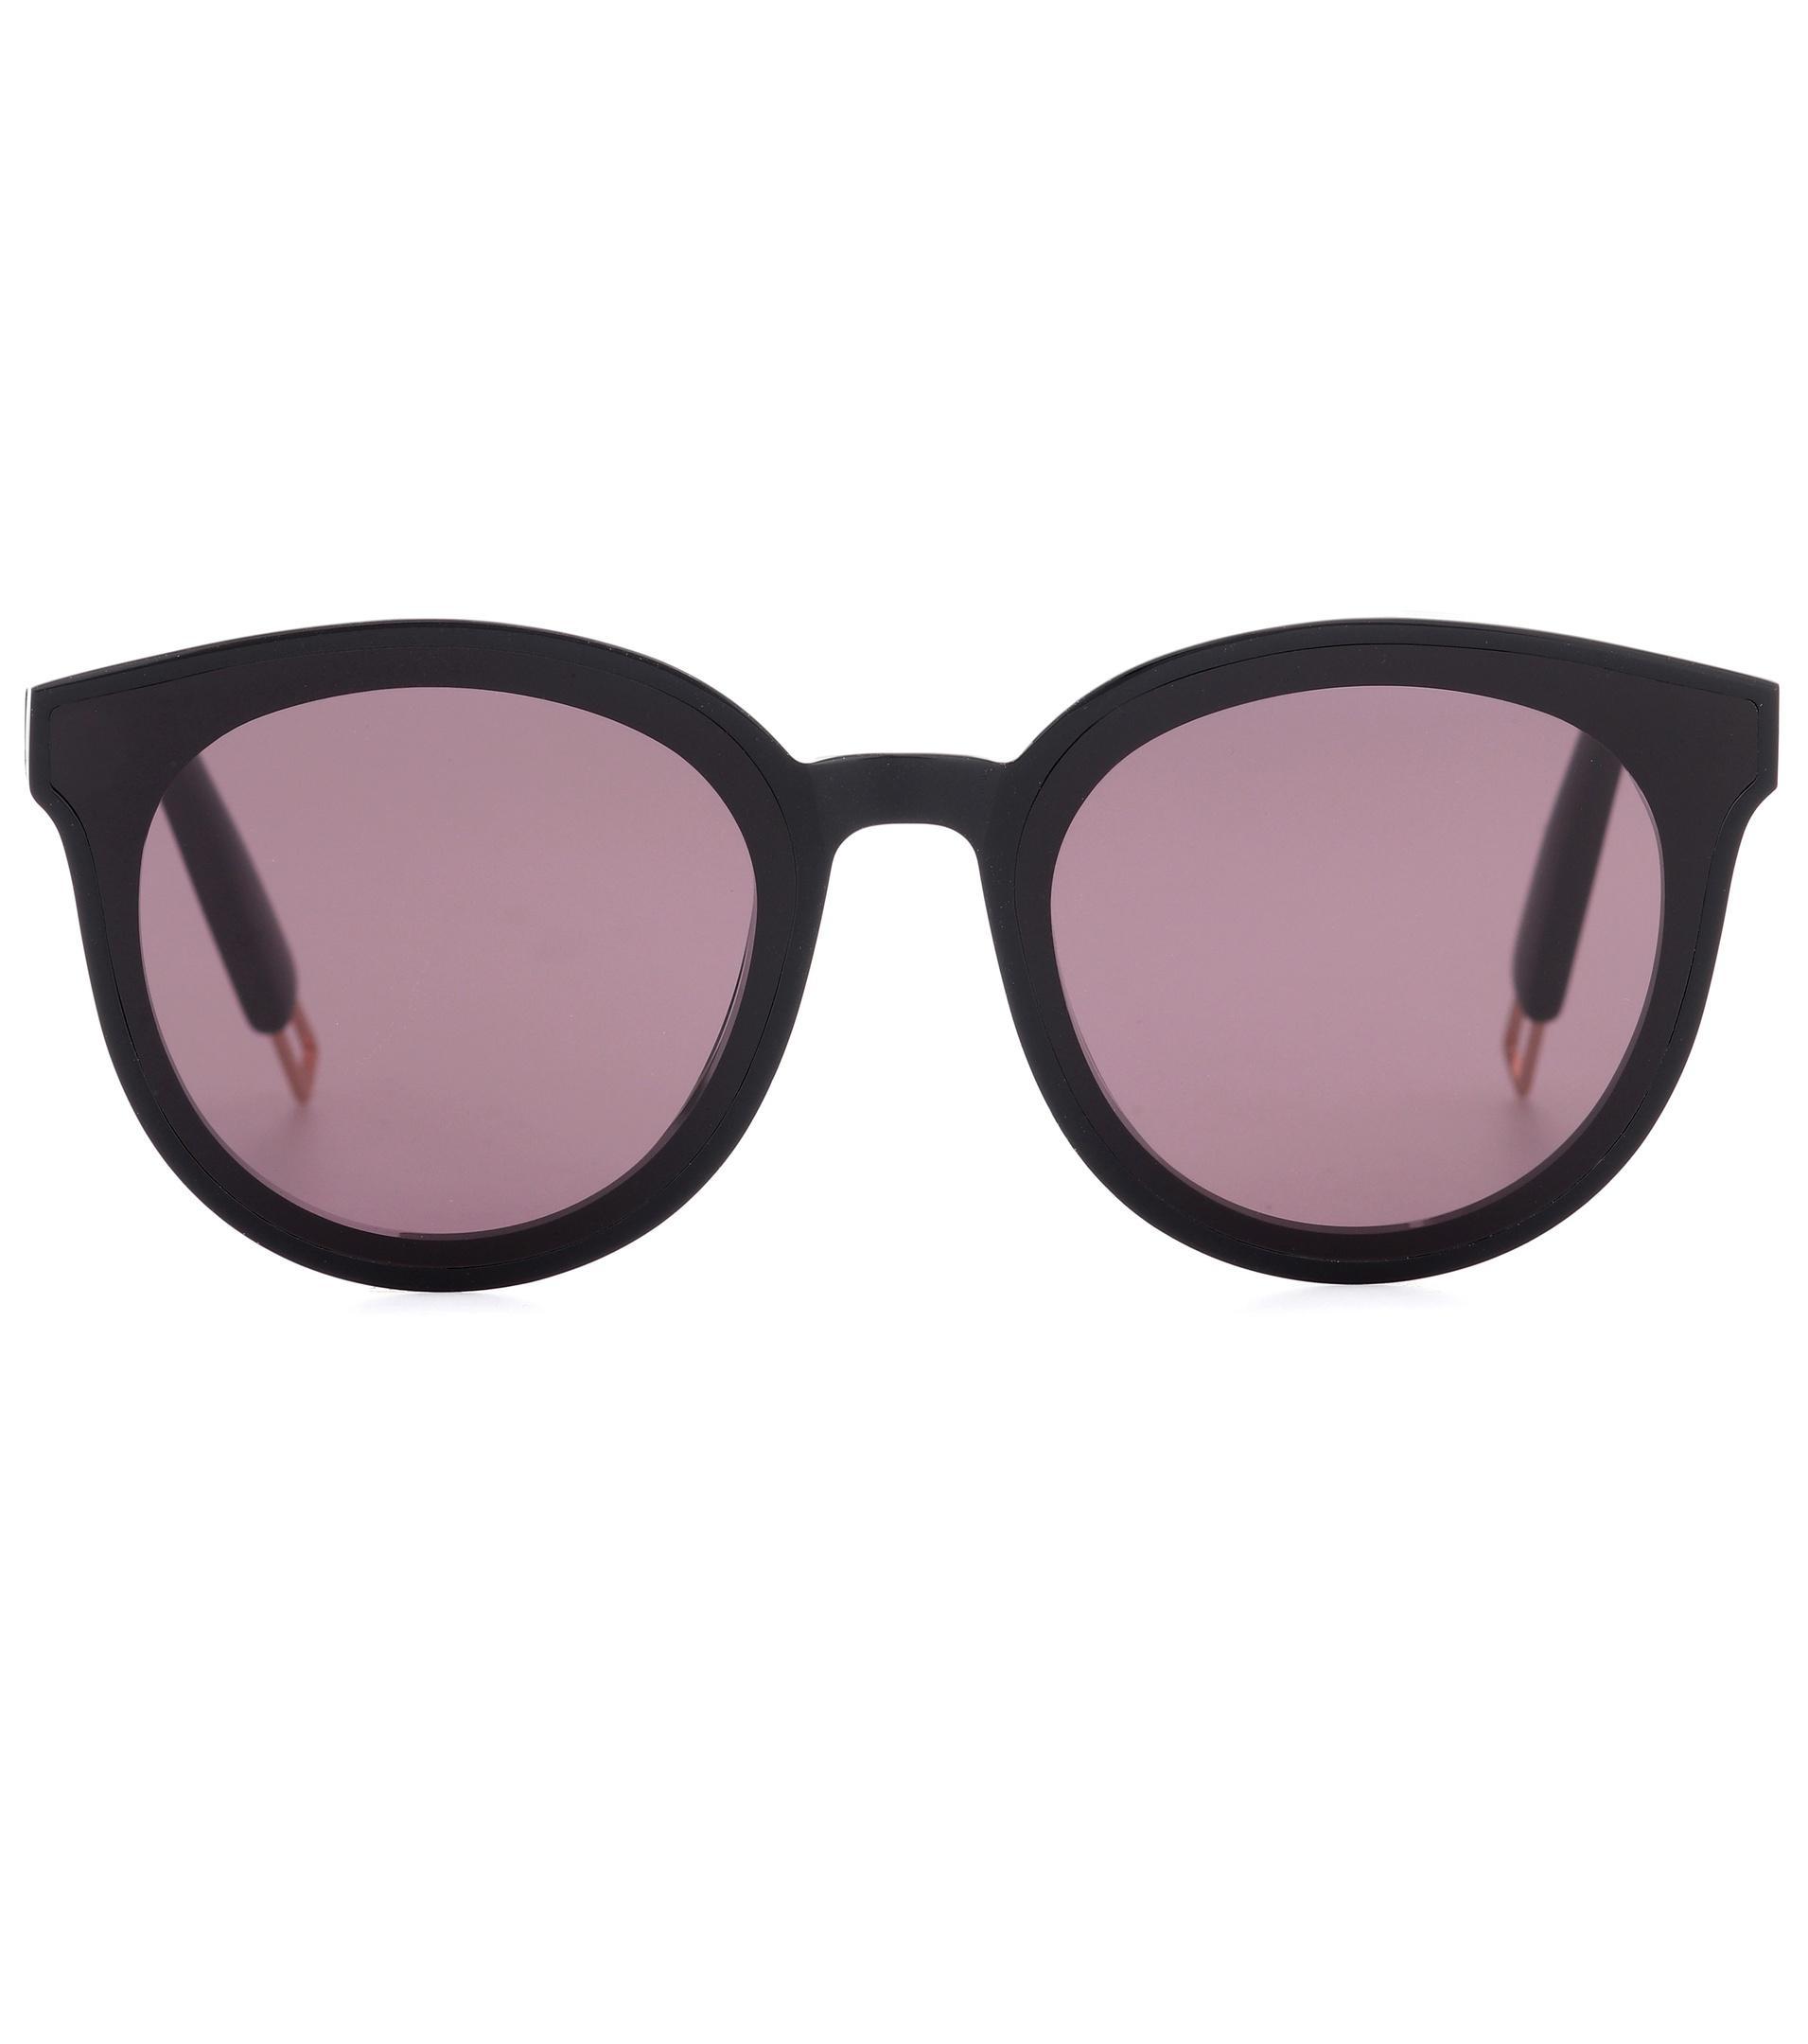 a03de72fa0b Gentle Monster Black Peter Sunglasses in Black - Lyst